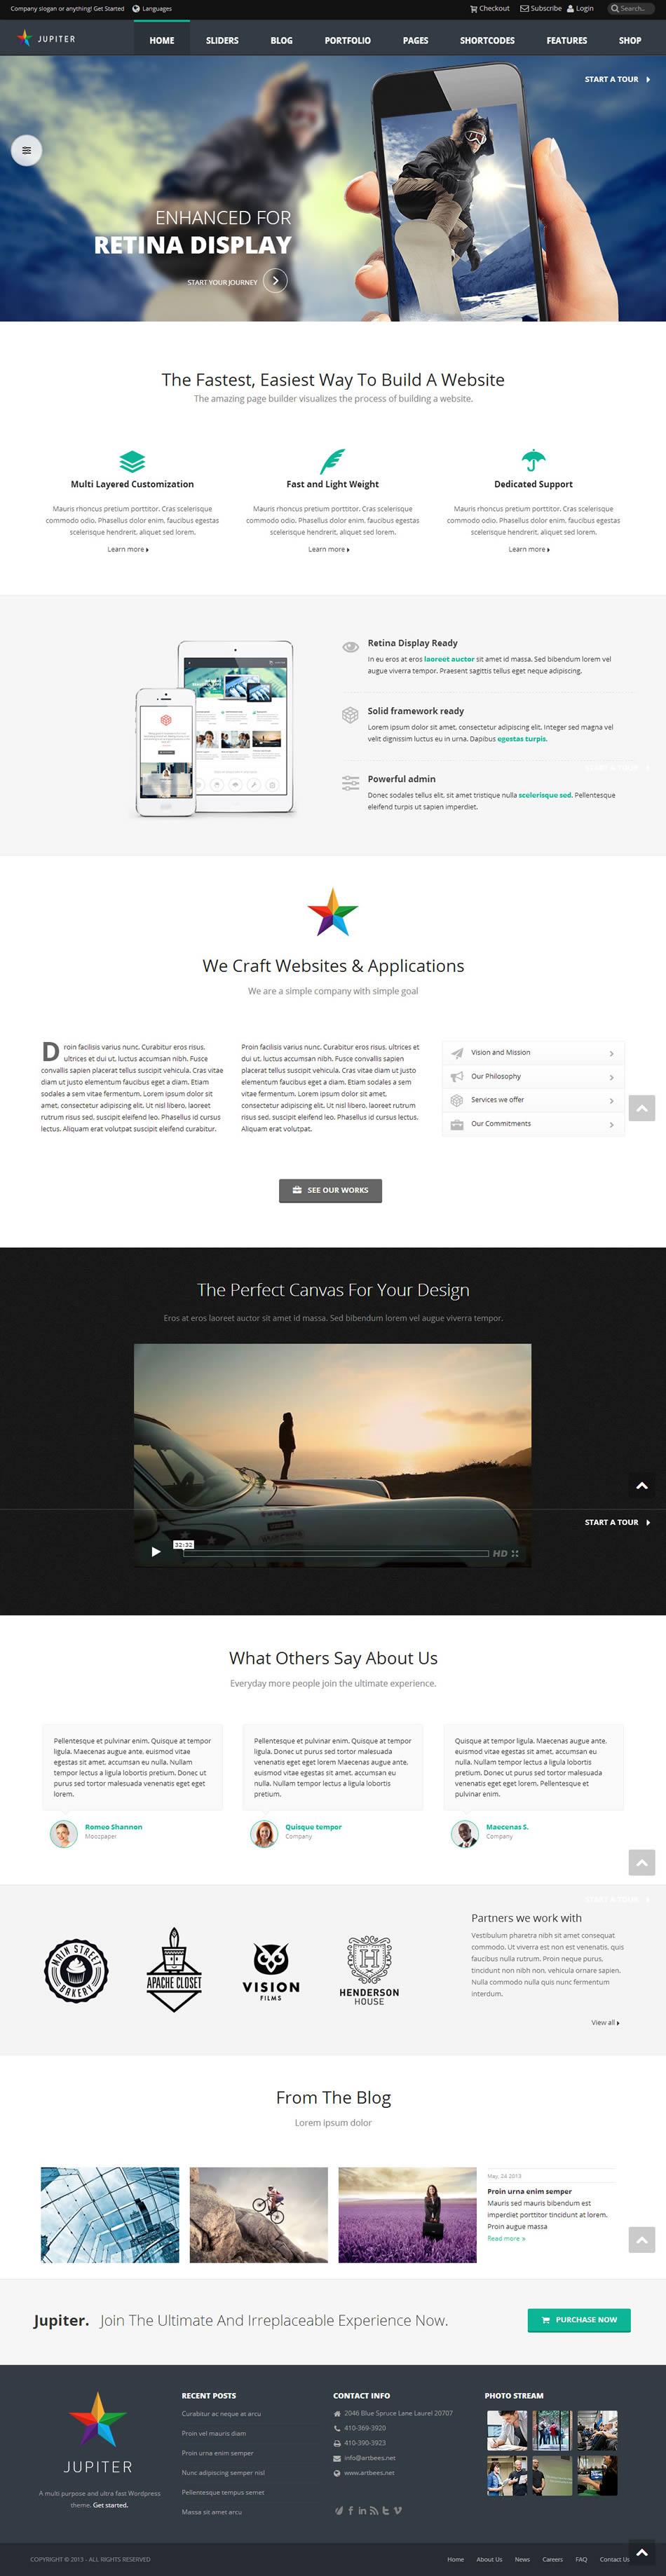 jupiter wordpress theme screenshot